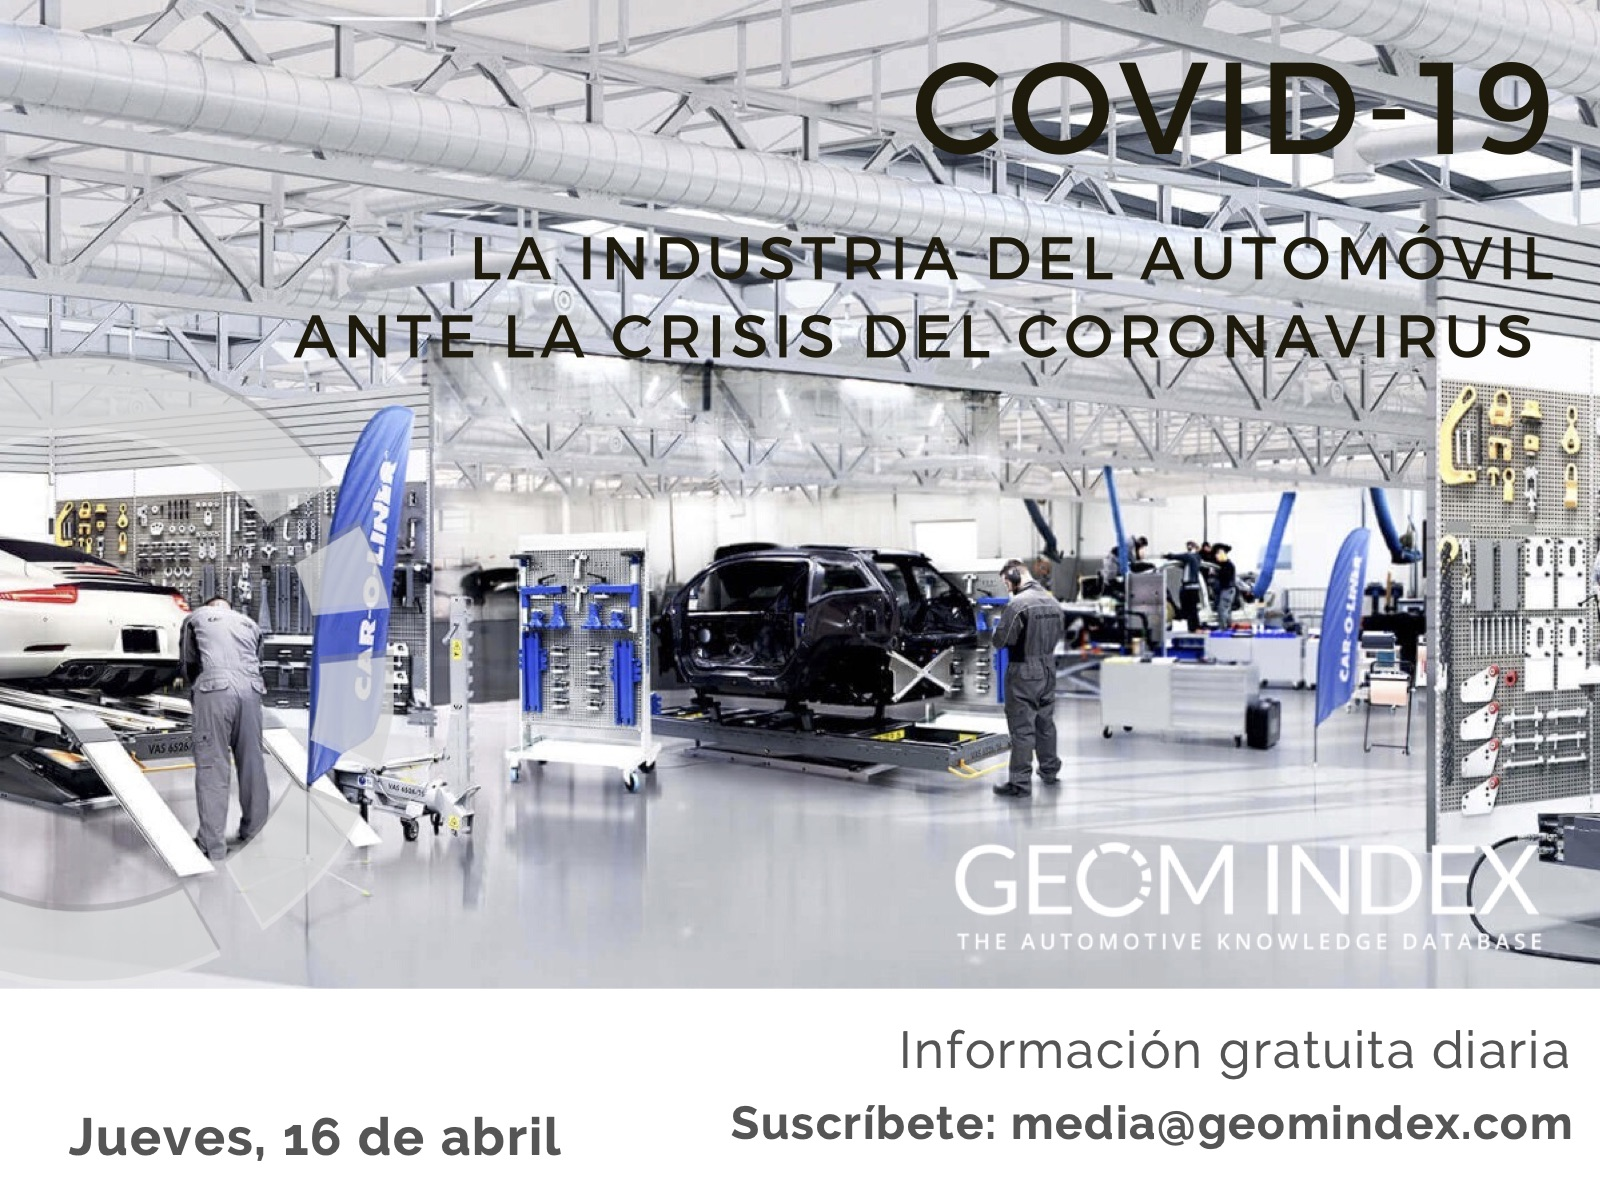 Informe 16 de abril – La industria del automóvil ante la crisis del Covid-19